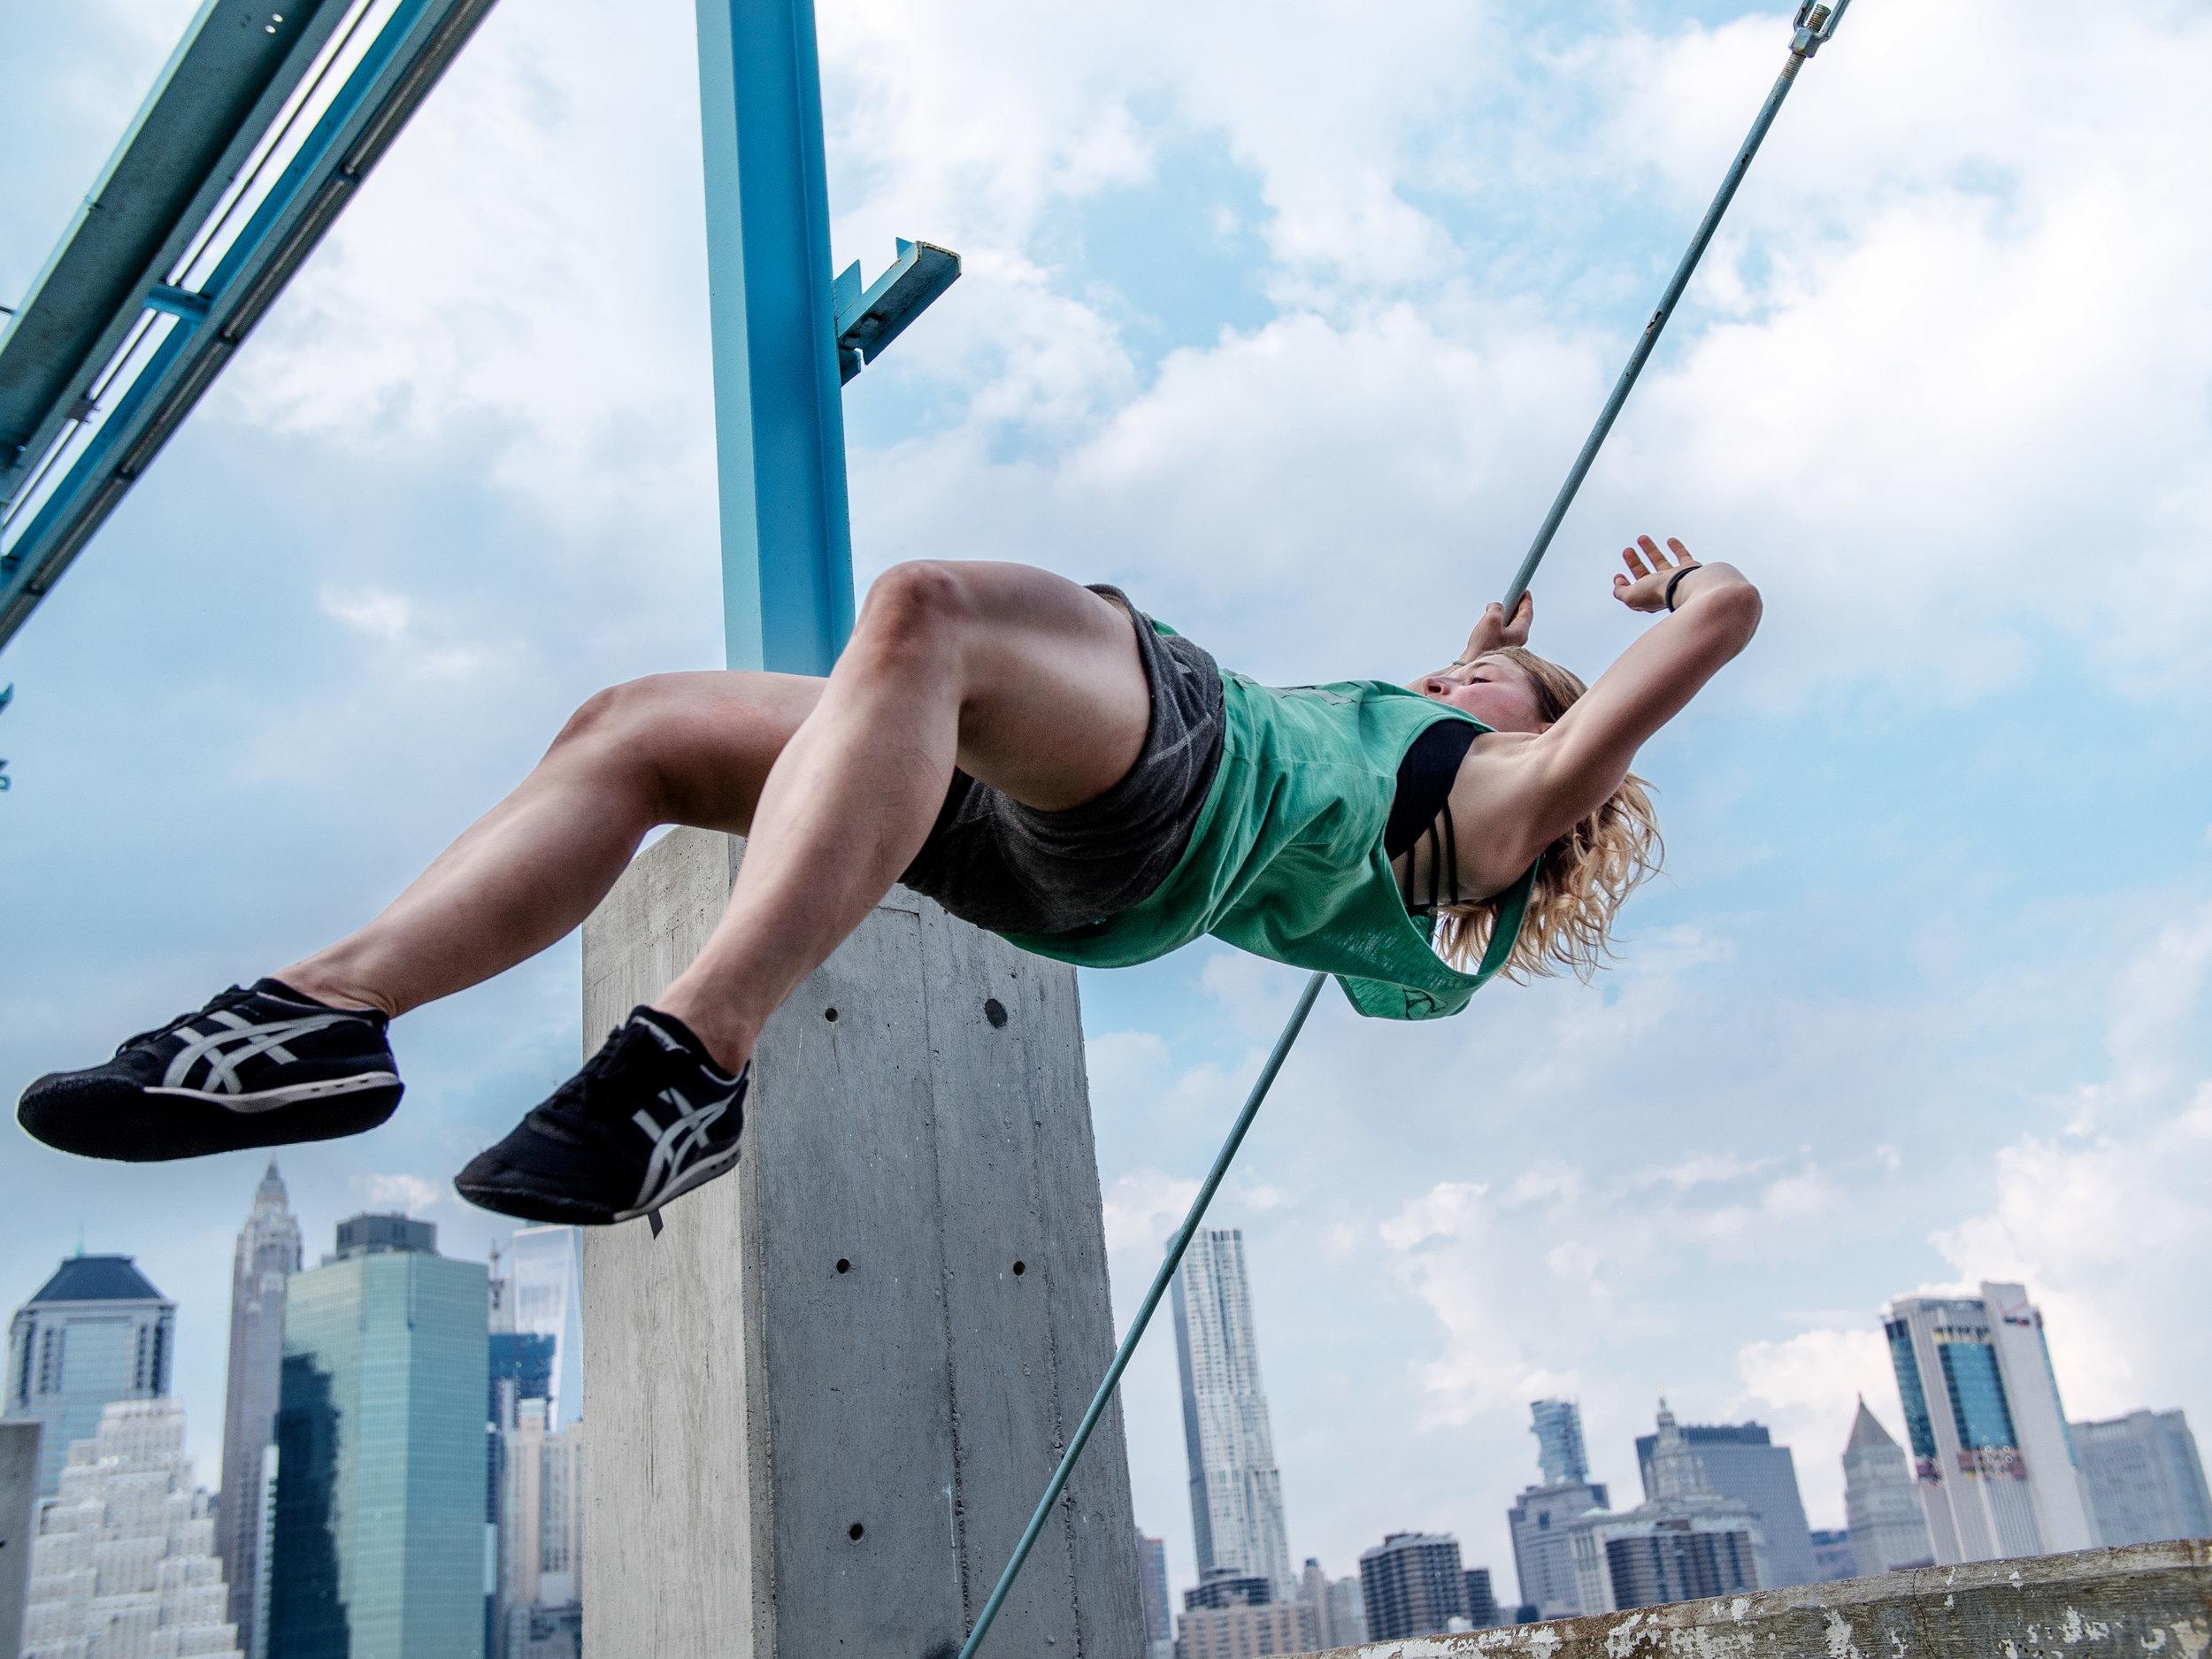 Nikkie-Zanevsky-Parkour-Freerunning-New-York-NYC-Brooklyn-Skochypstiks-Woman-Traceuse-Steve-Zavitz